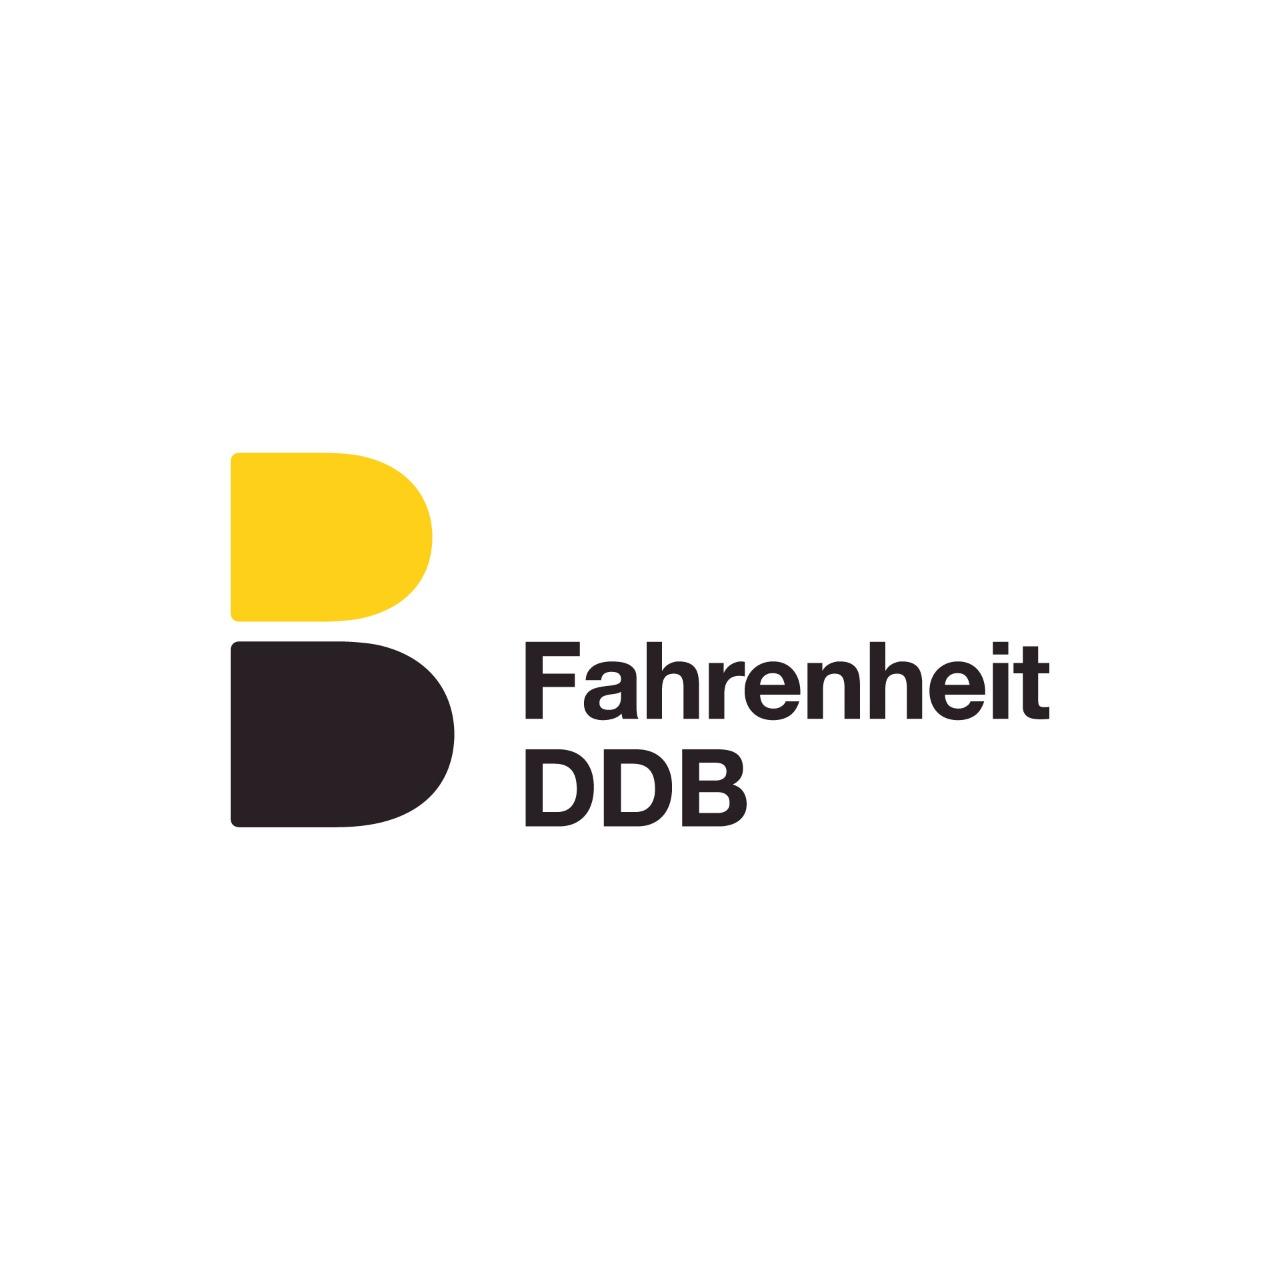 Fahrenheit DDB